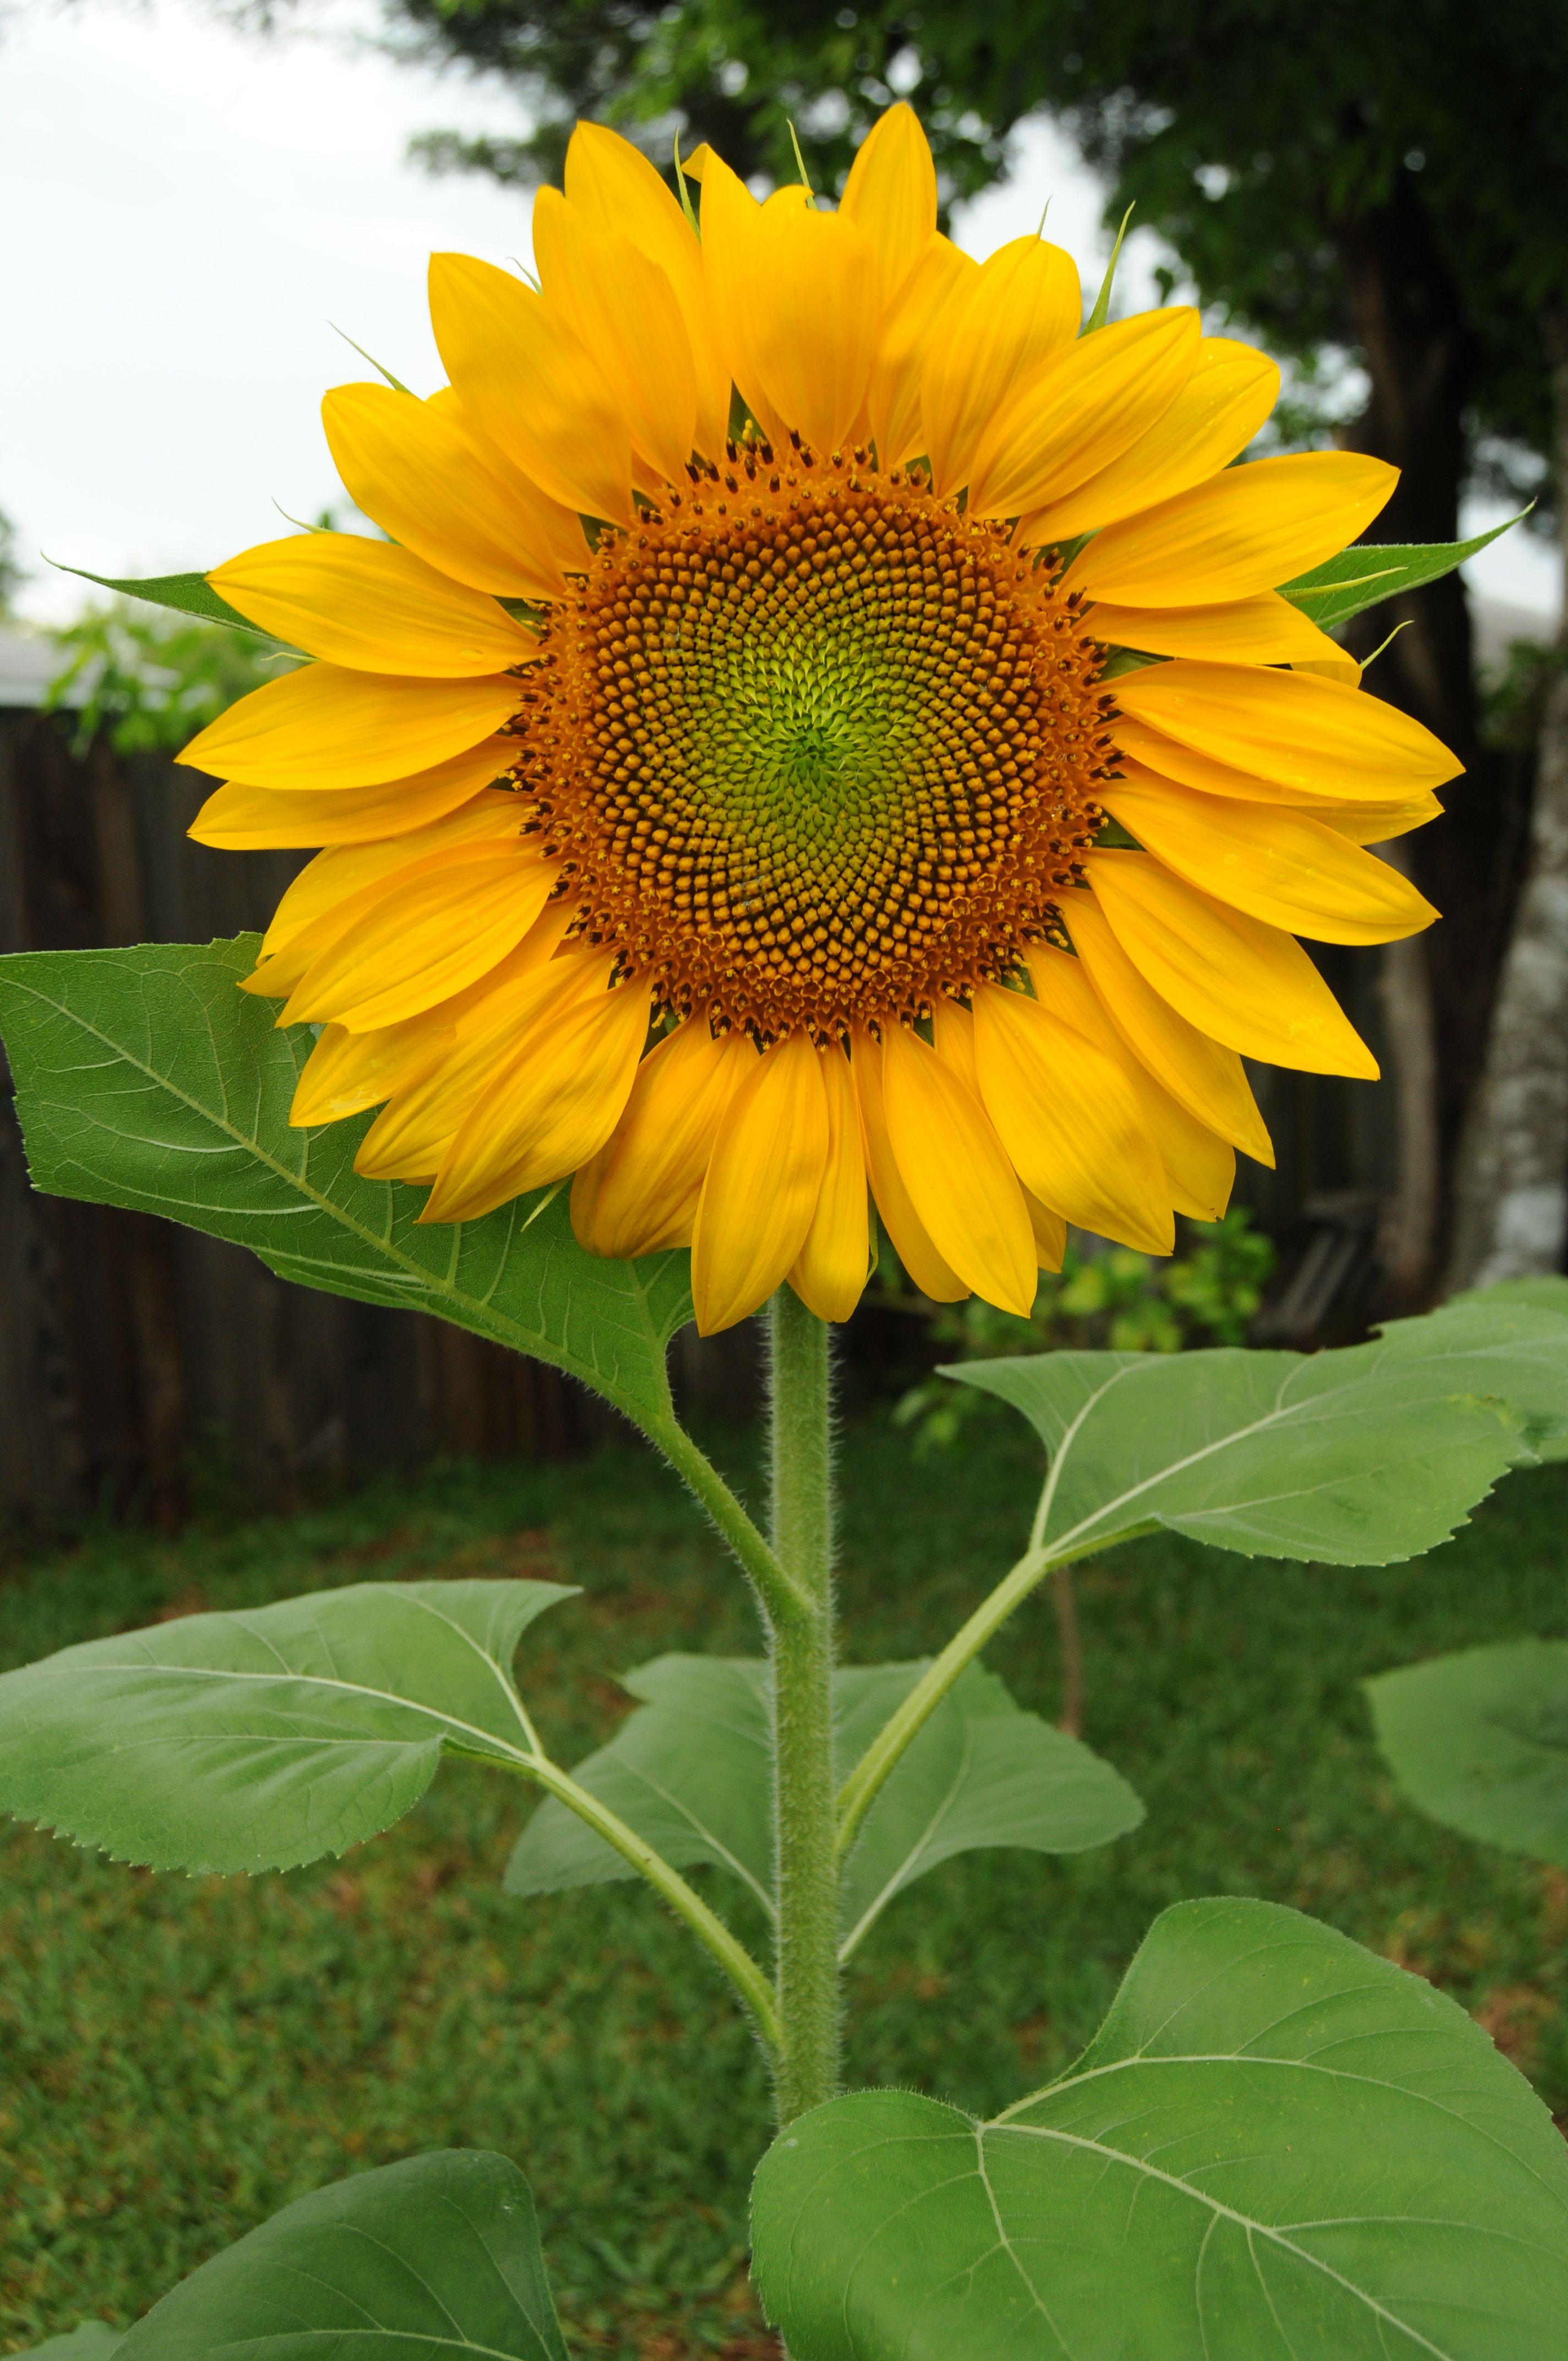 Sunflowers make me smile..